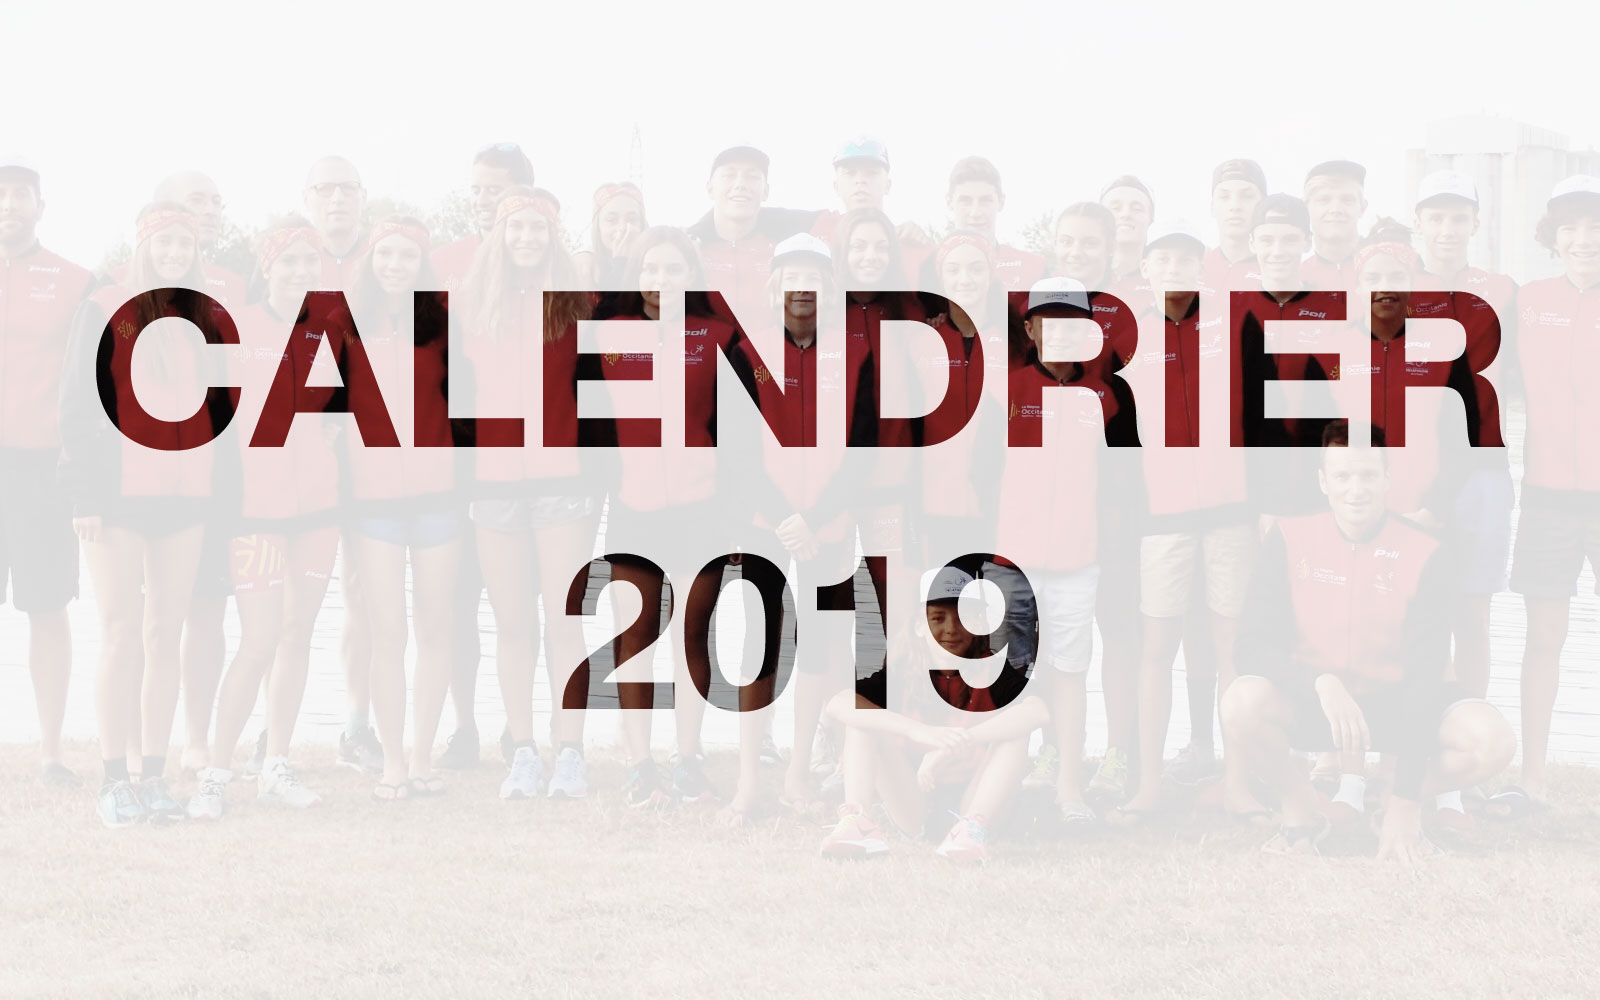 Biathlon 2019 Calendrier.Calendrier 2019 Ligue Regionale De Triathlon Occitanie